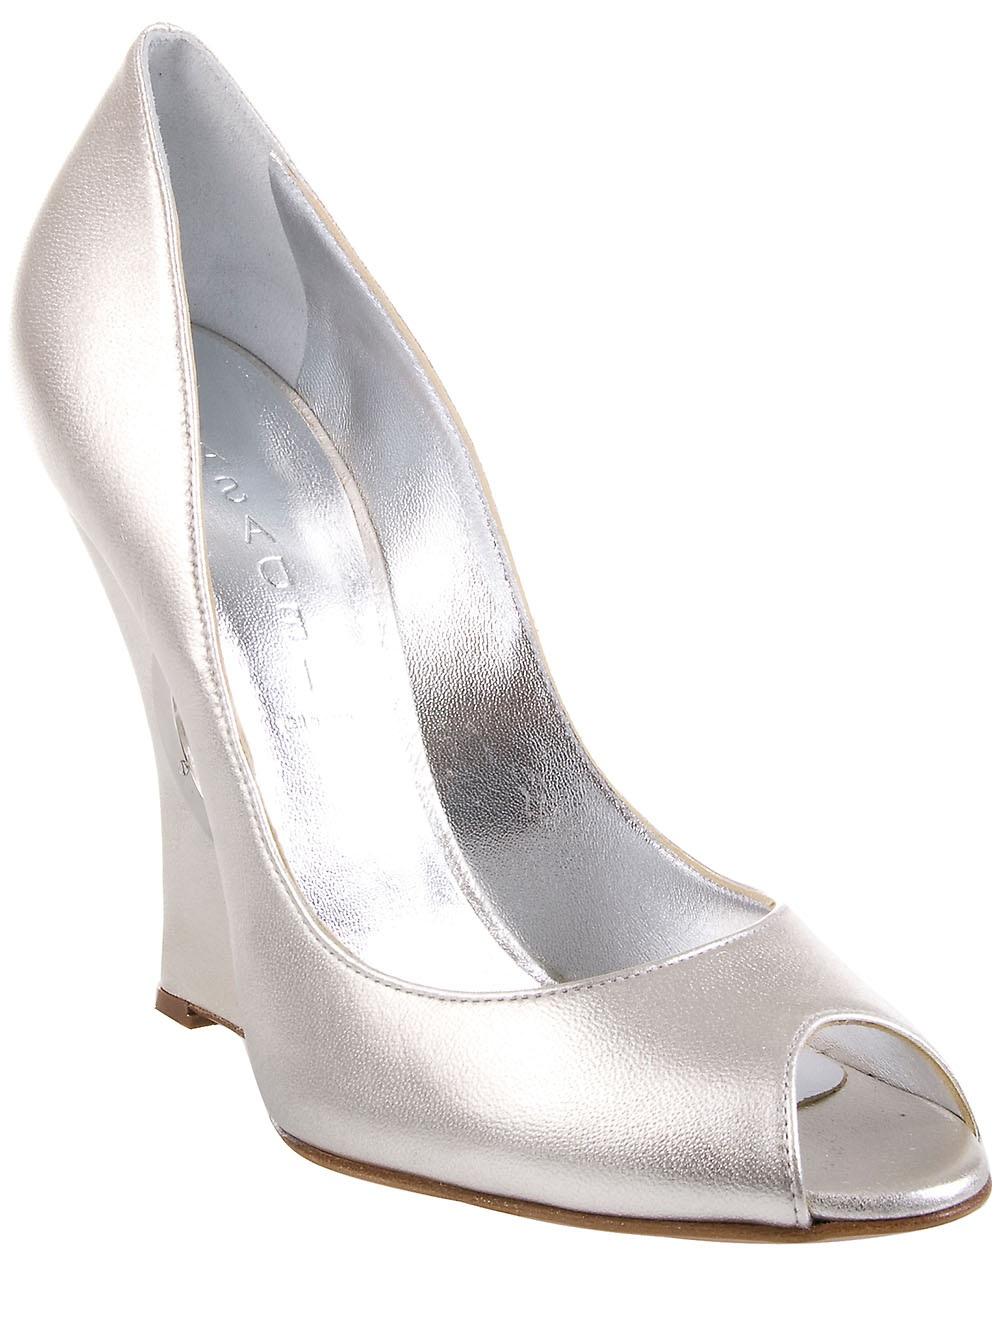 Silver Shoes High Heels Selfridges